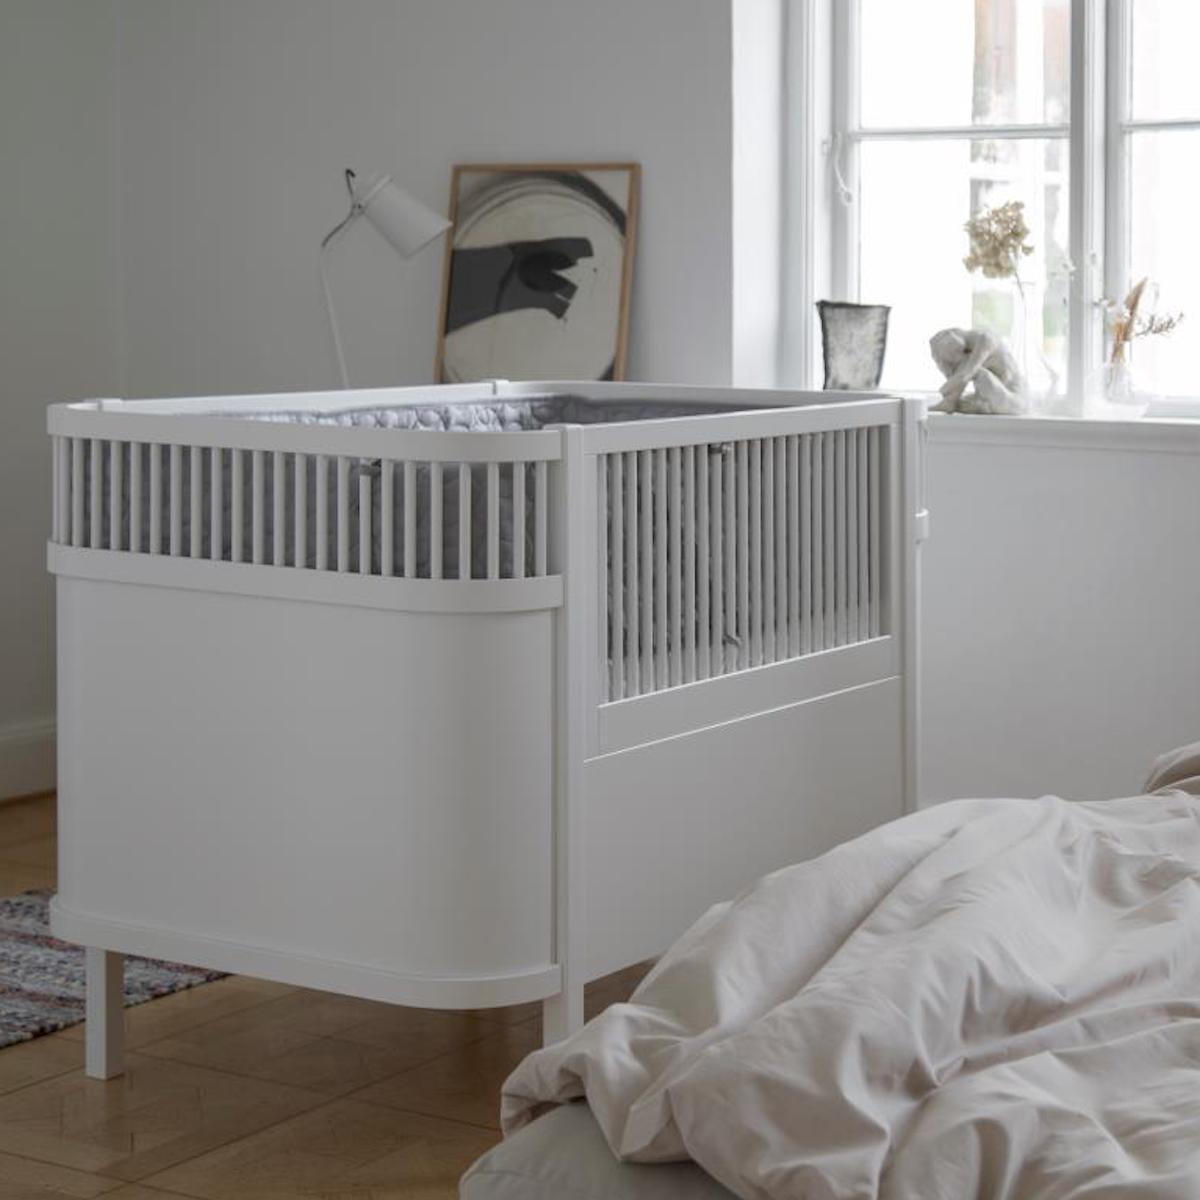 Lit bébé évolutif Sebra classic white